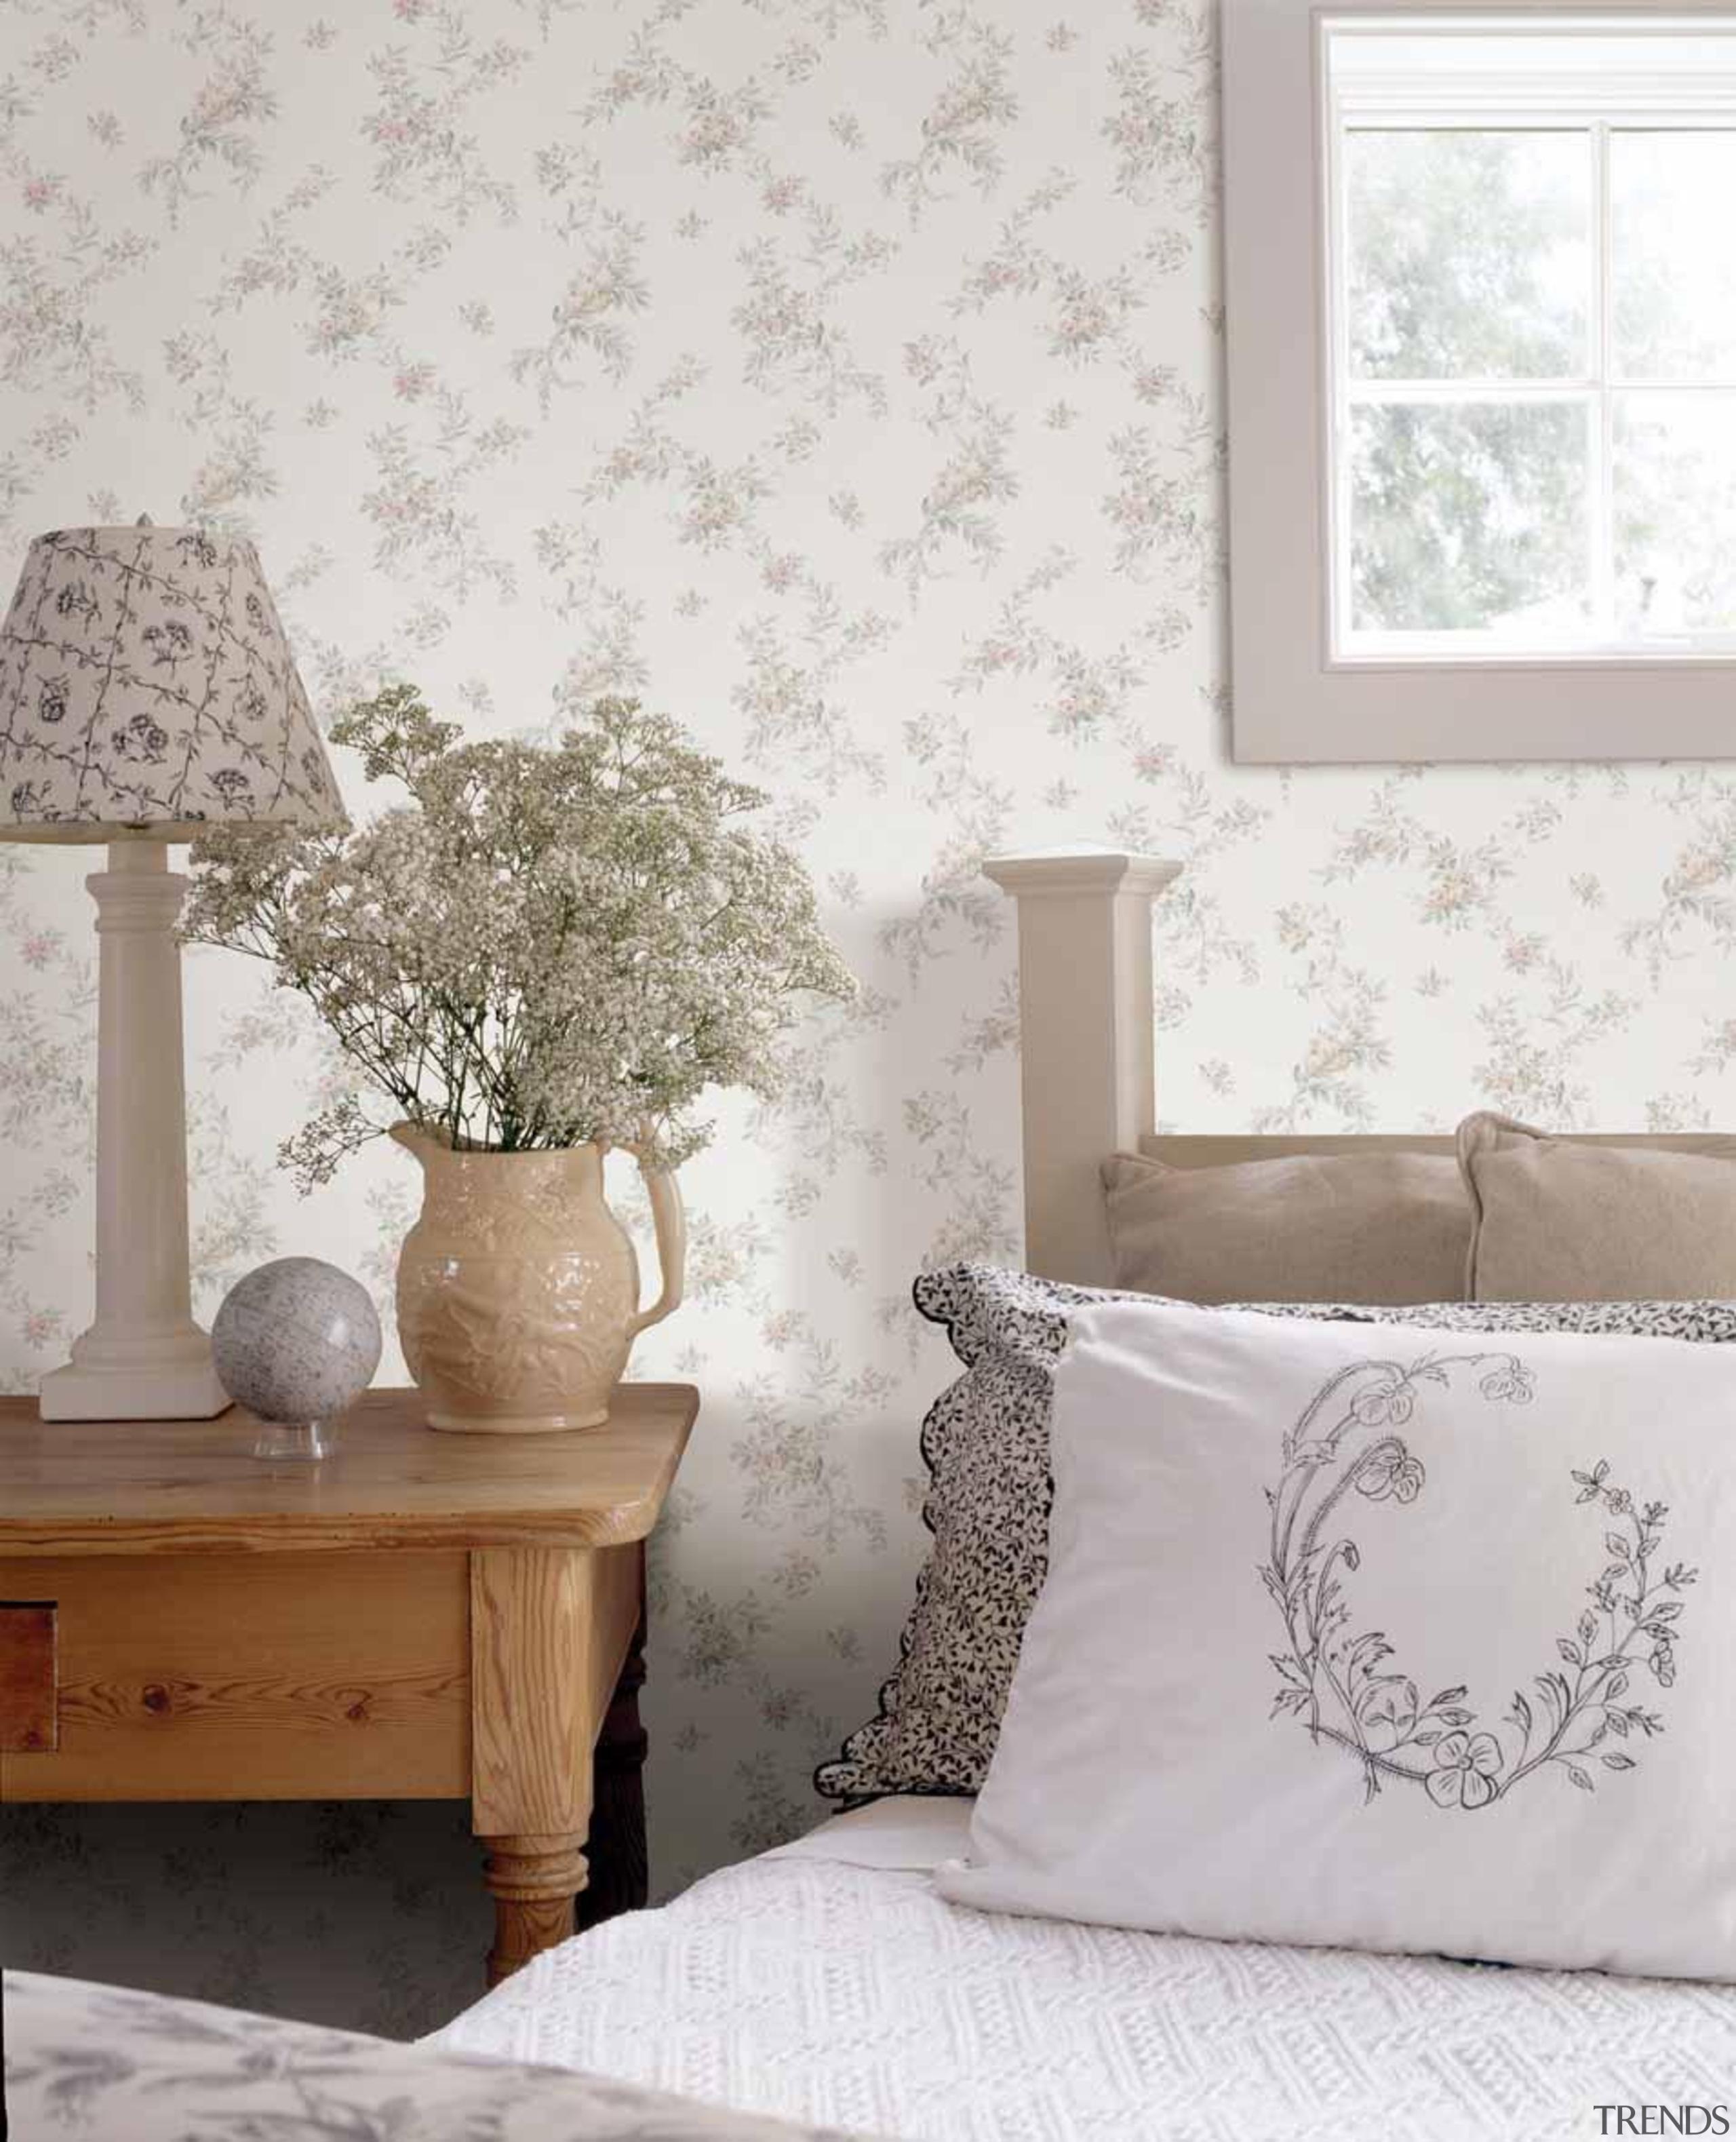 Modern Style Range - bed   bed frame bed, bed frame, bed sheet, bedding, bedroom, cushion, duvet cover, home, interior design, linens, living room, pillow, room, textile, wall, wallpaper, window, white